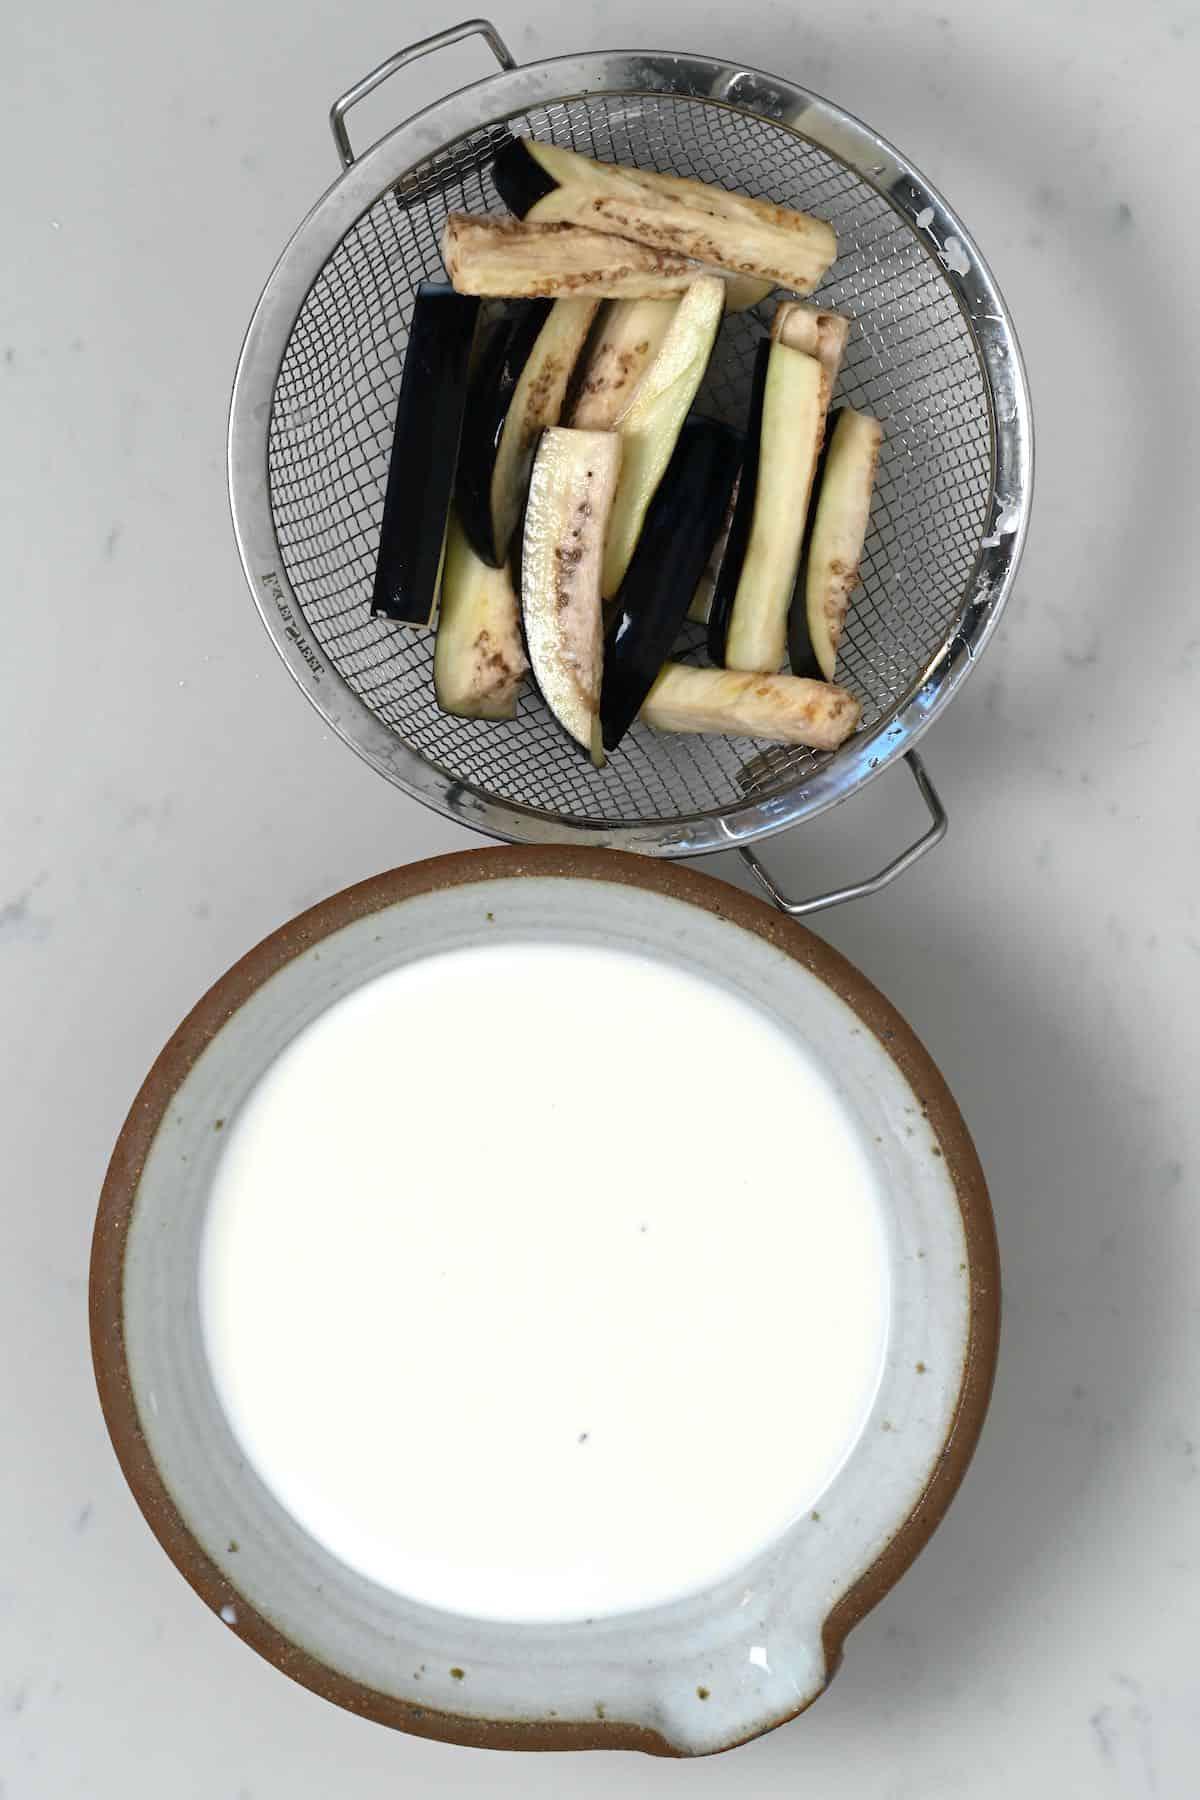 Eggplant slices soaked in milk